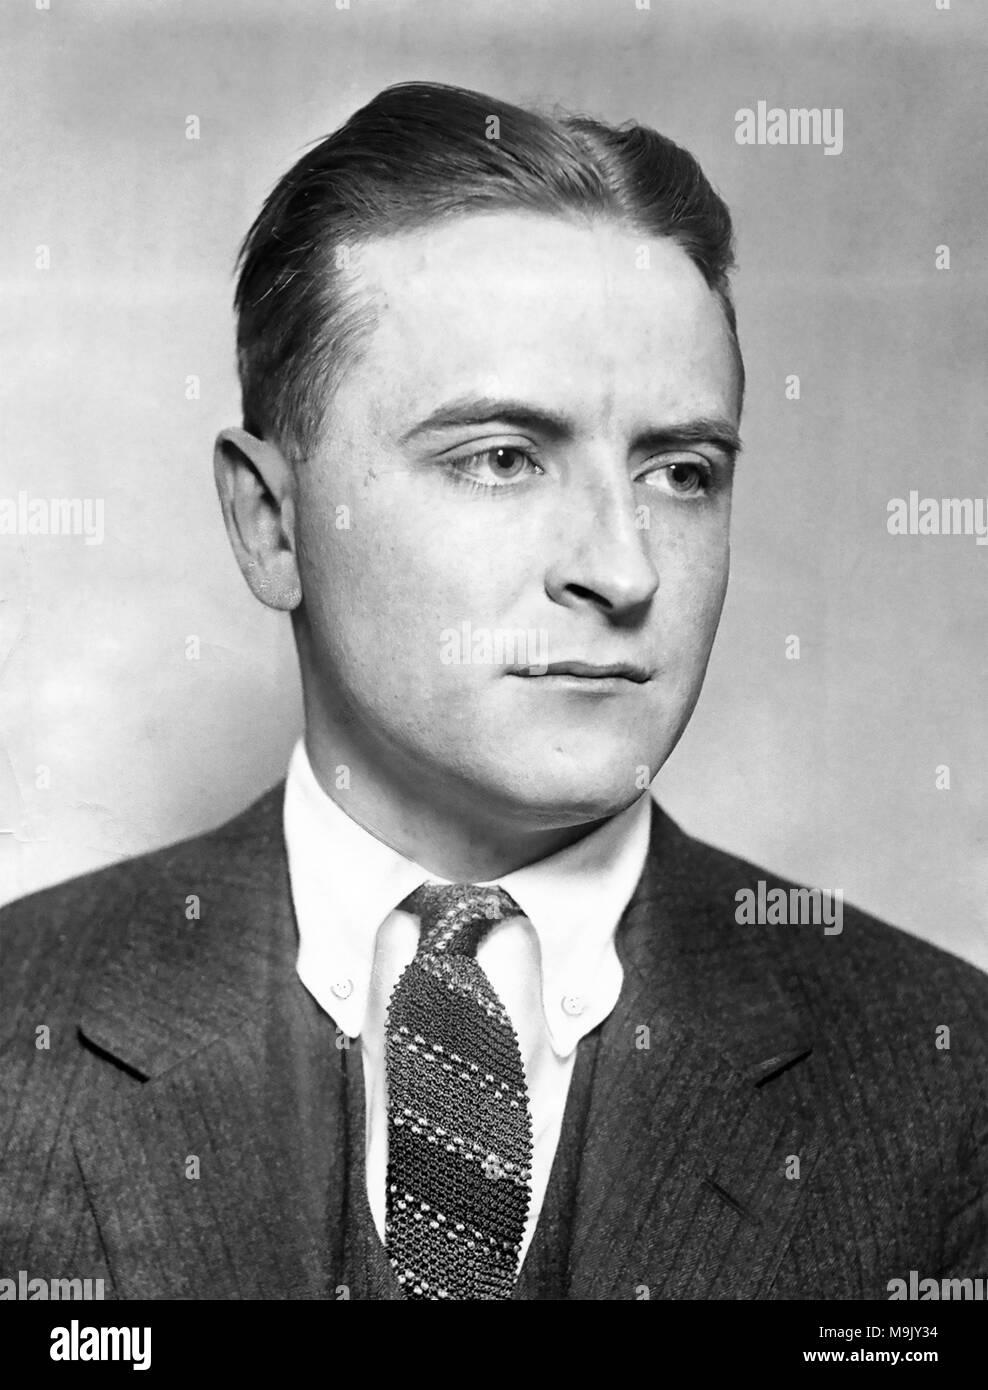 F Scott Fitzgerald 1896 1940 American Novelist About 1920